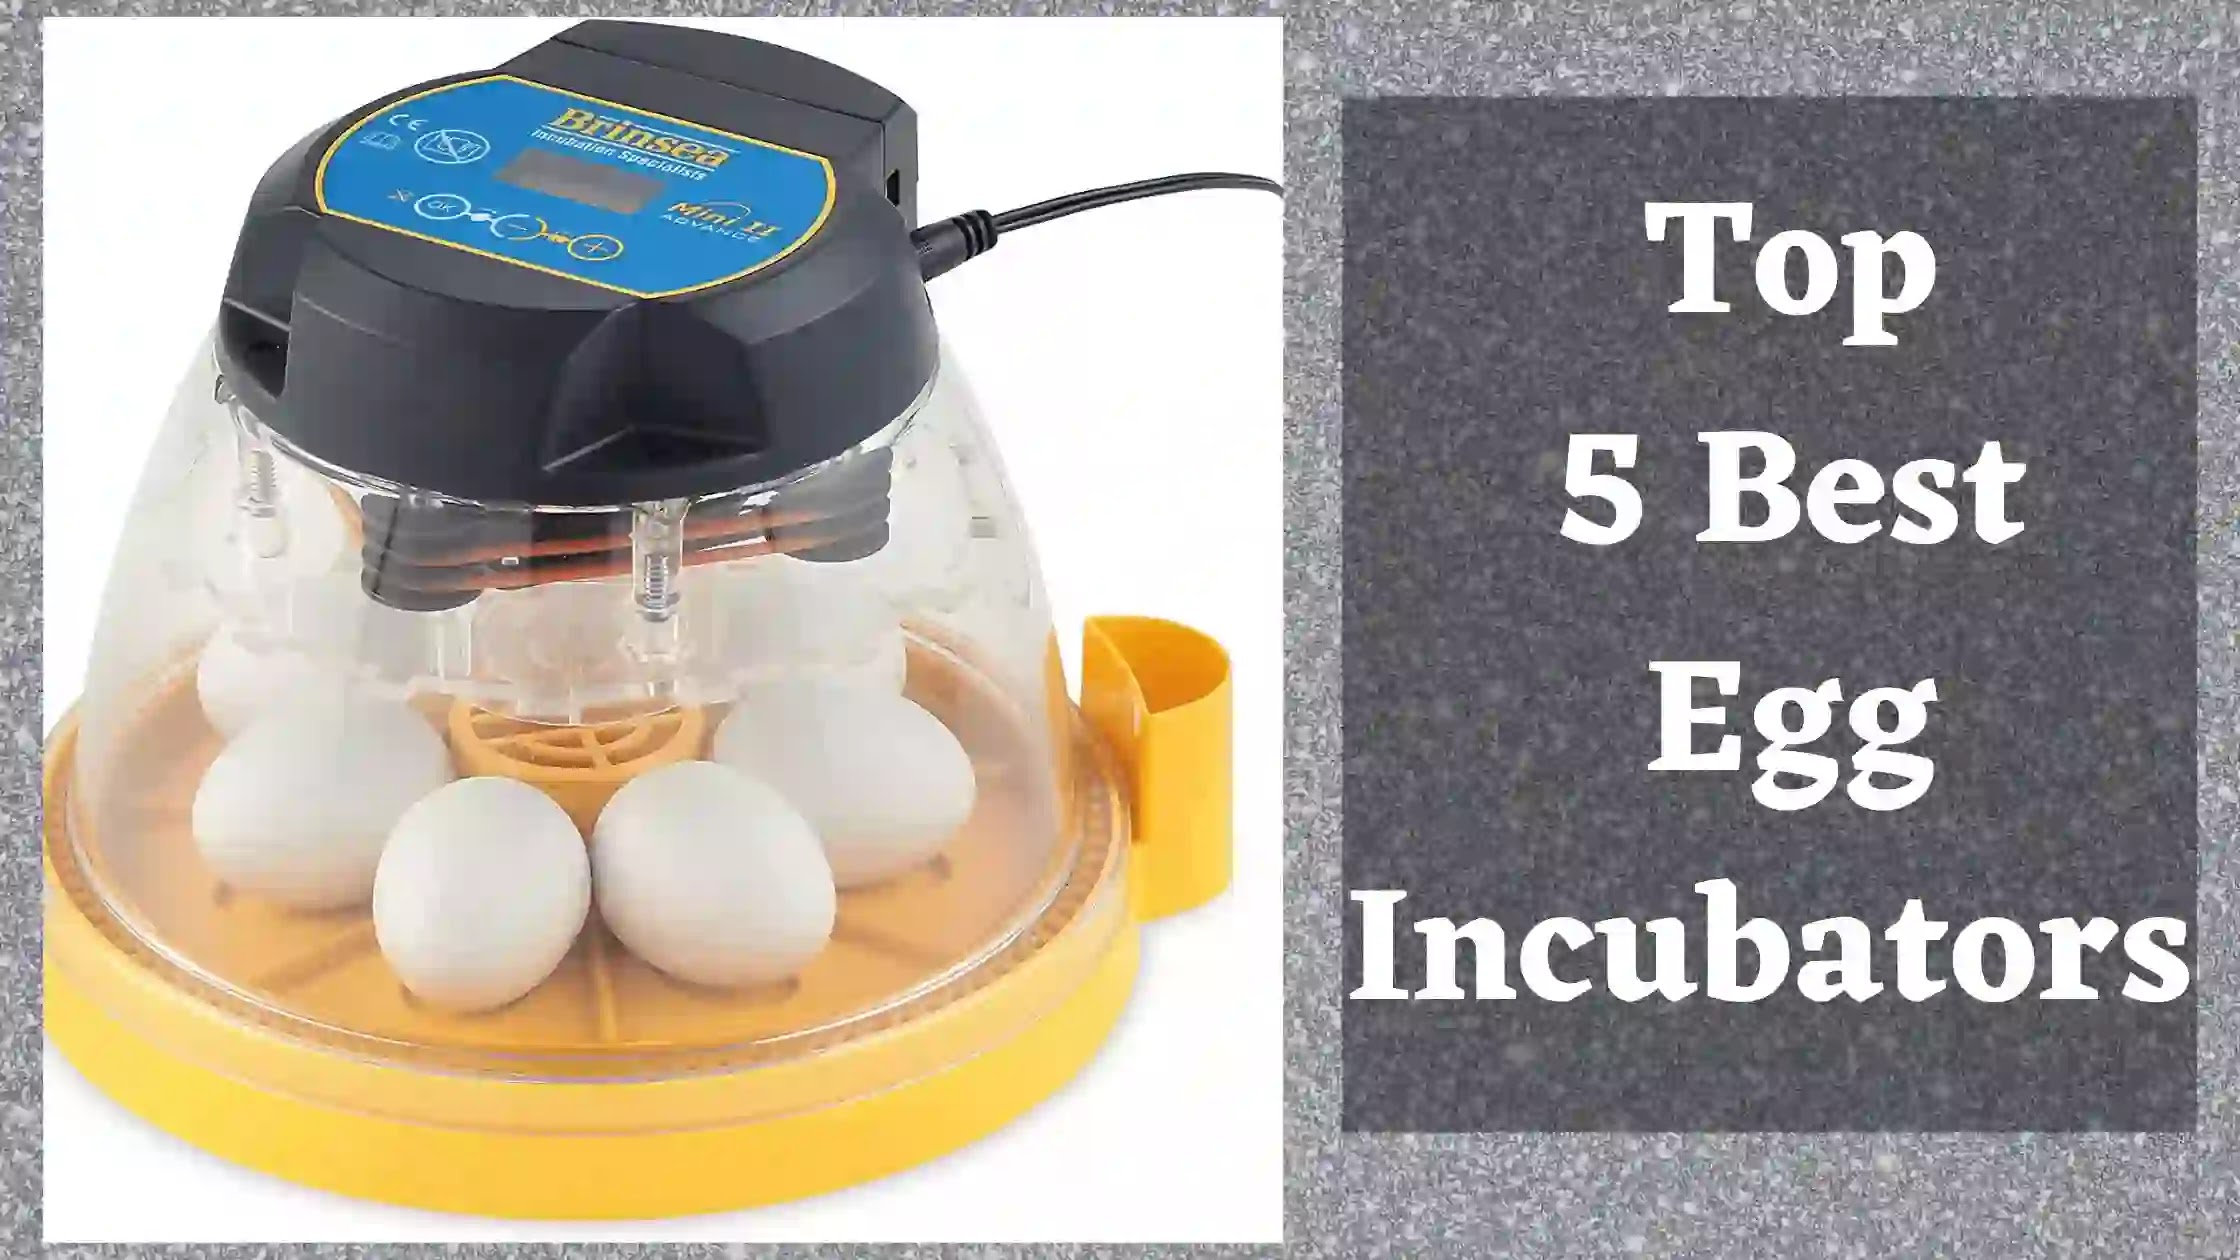 Best Egg incubators review